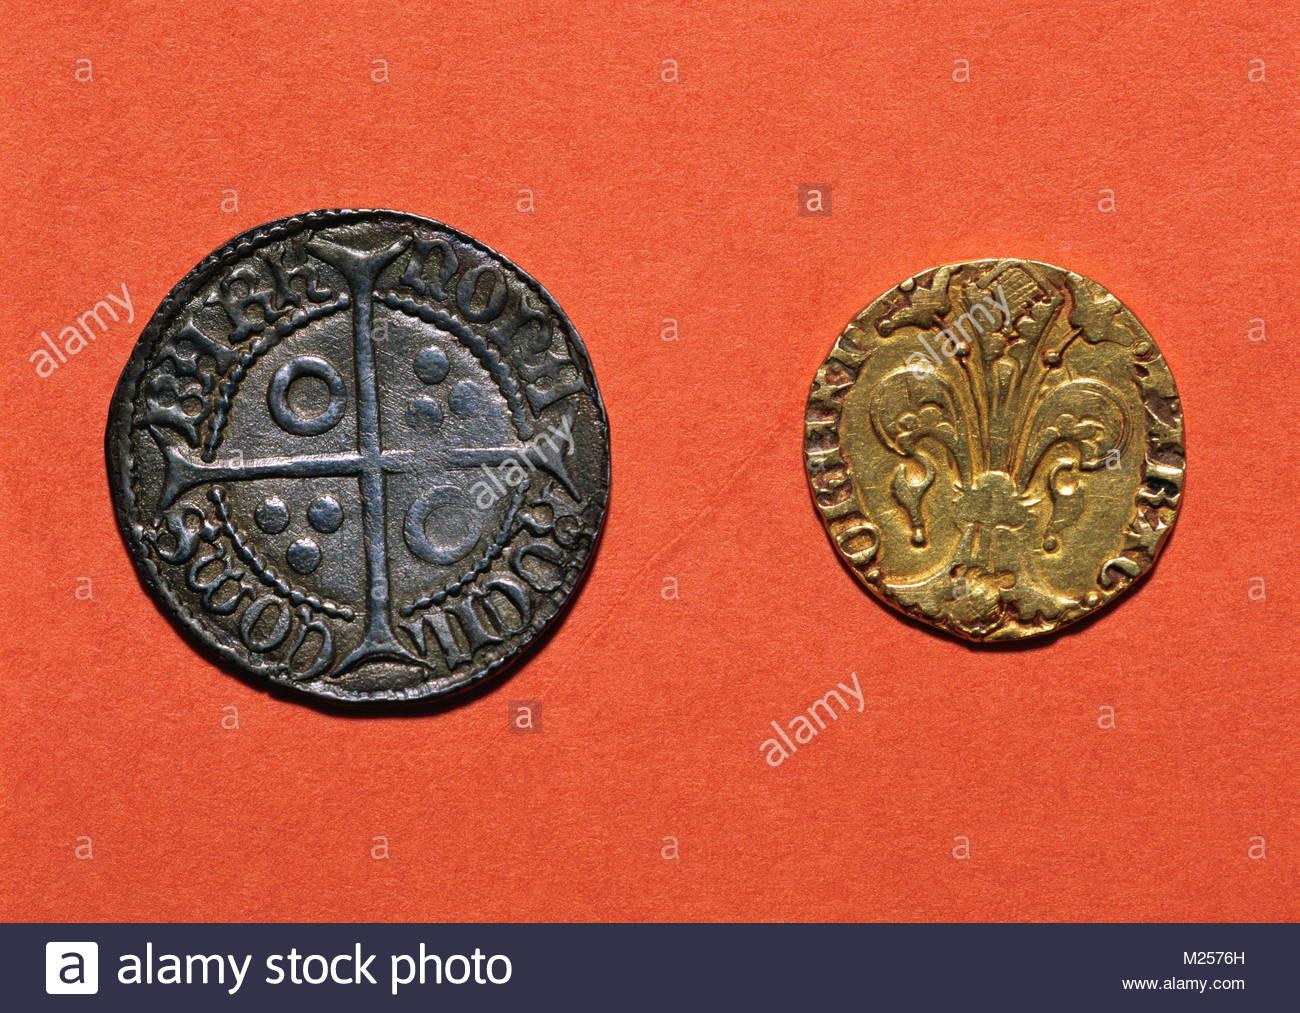 Mittelalterliche Münzen Links Kroate In Barcelona Geprägt